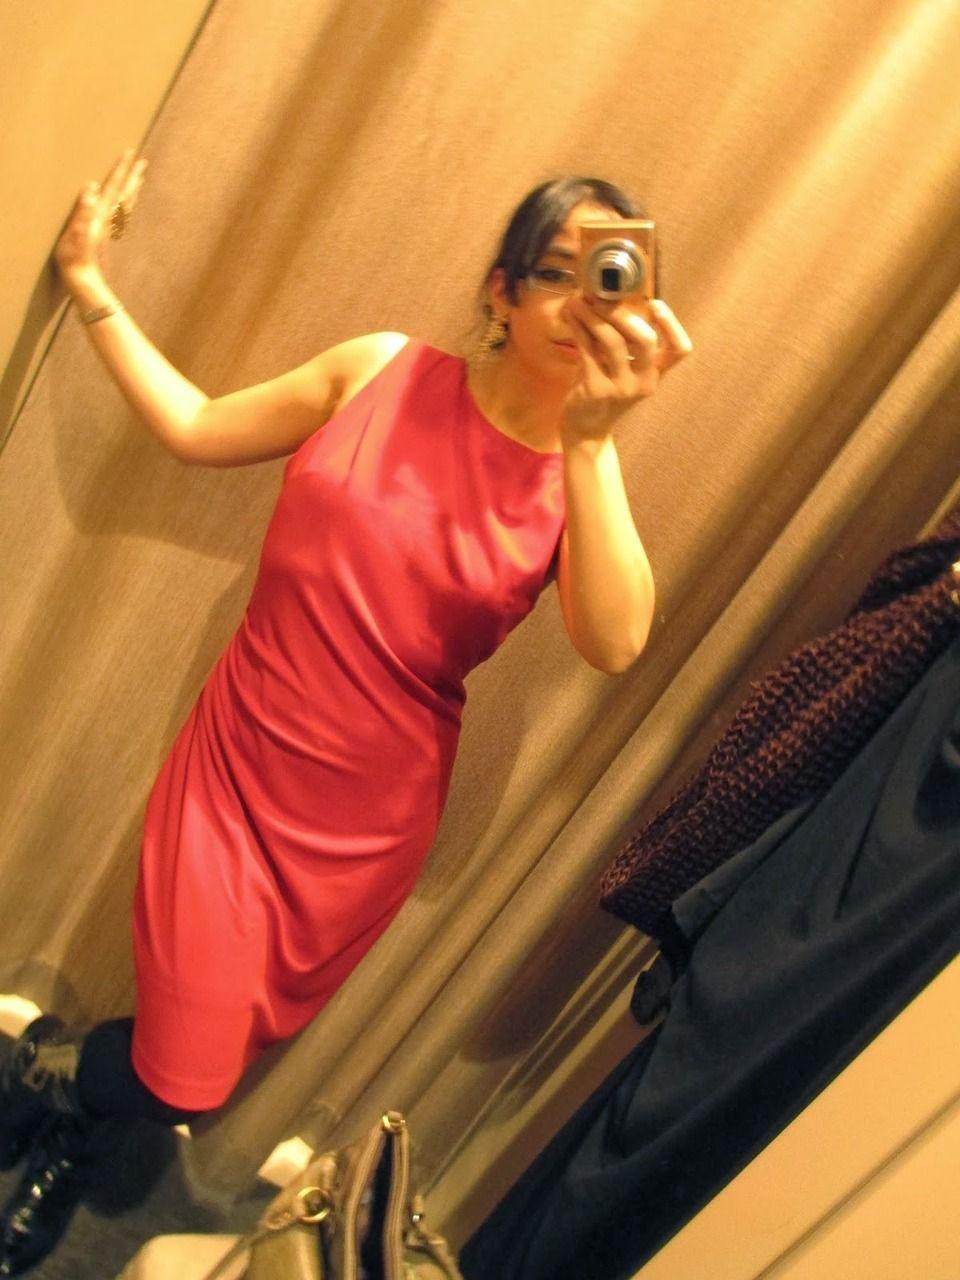 "♥ this look on whatiwear.com by DAHI KOCH ""NEW RED DRESS."" http://www.whatiwear.com/look/detail/151426"